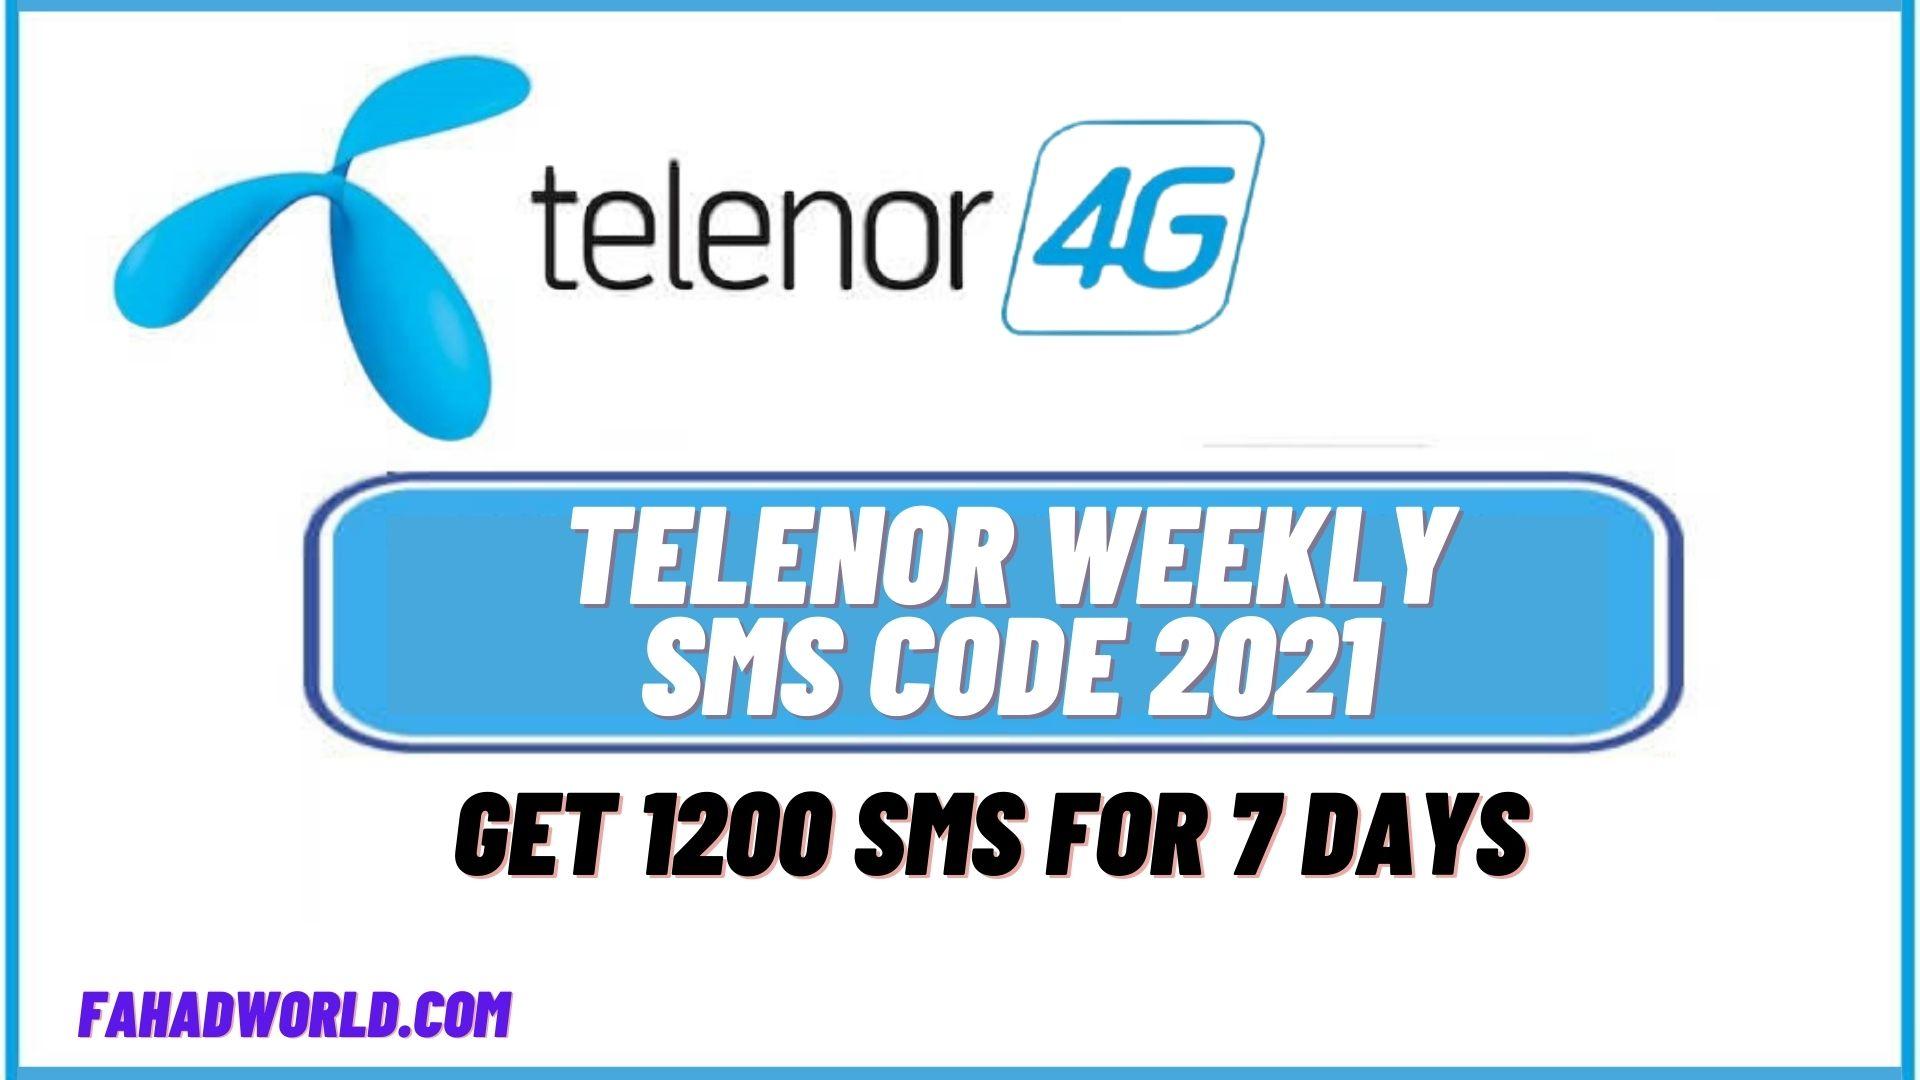 telenor weekly sms code